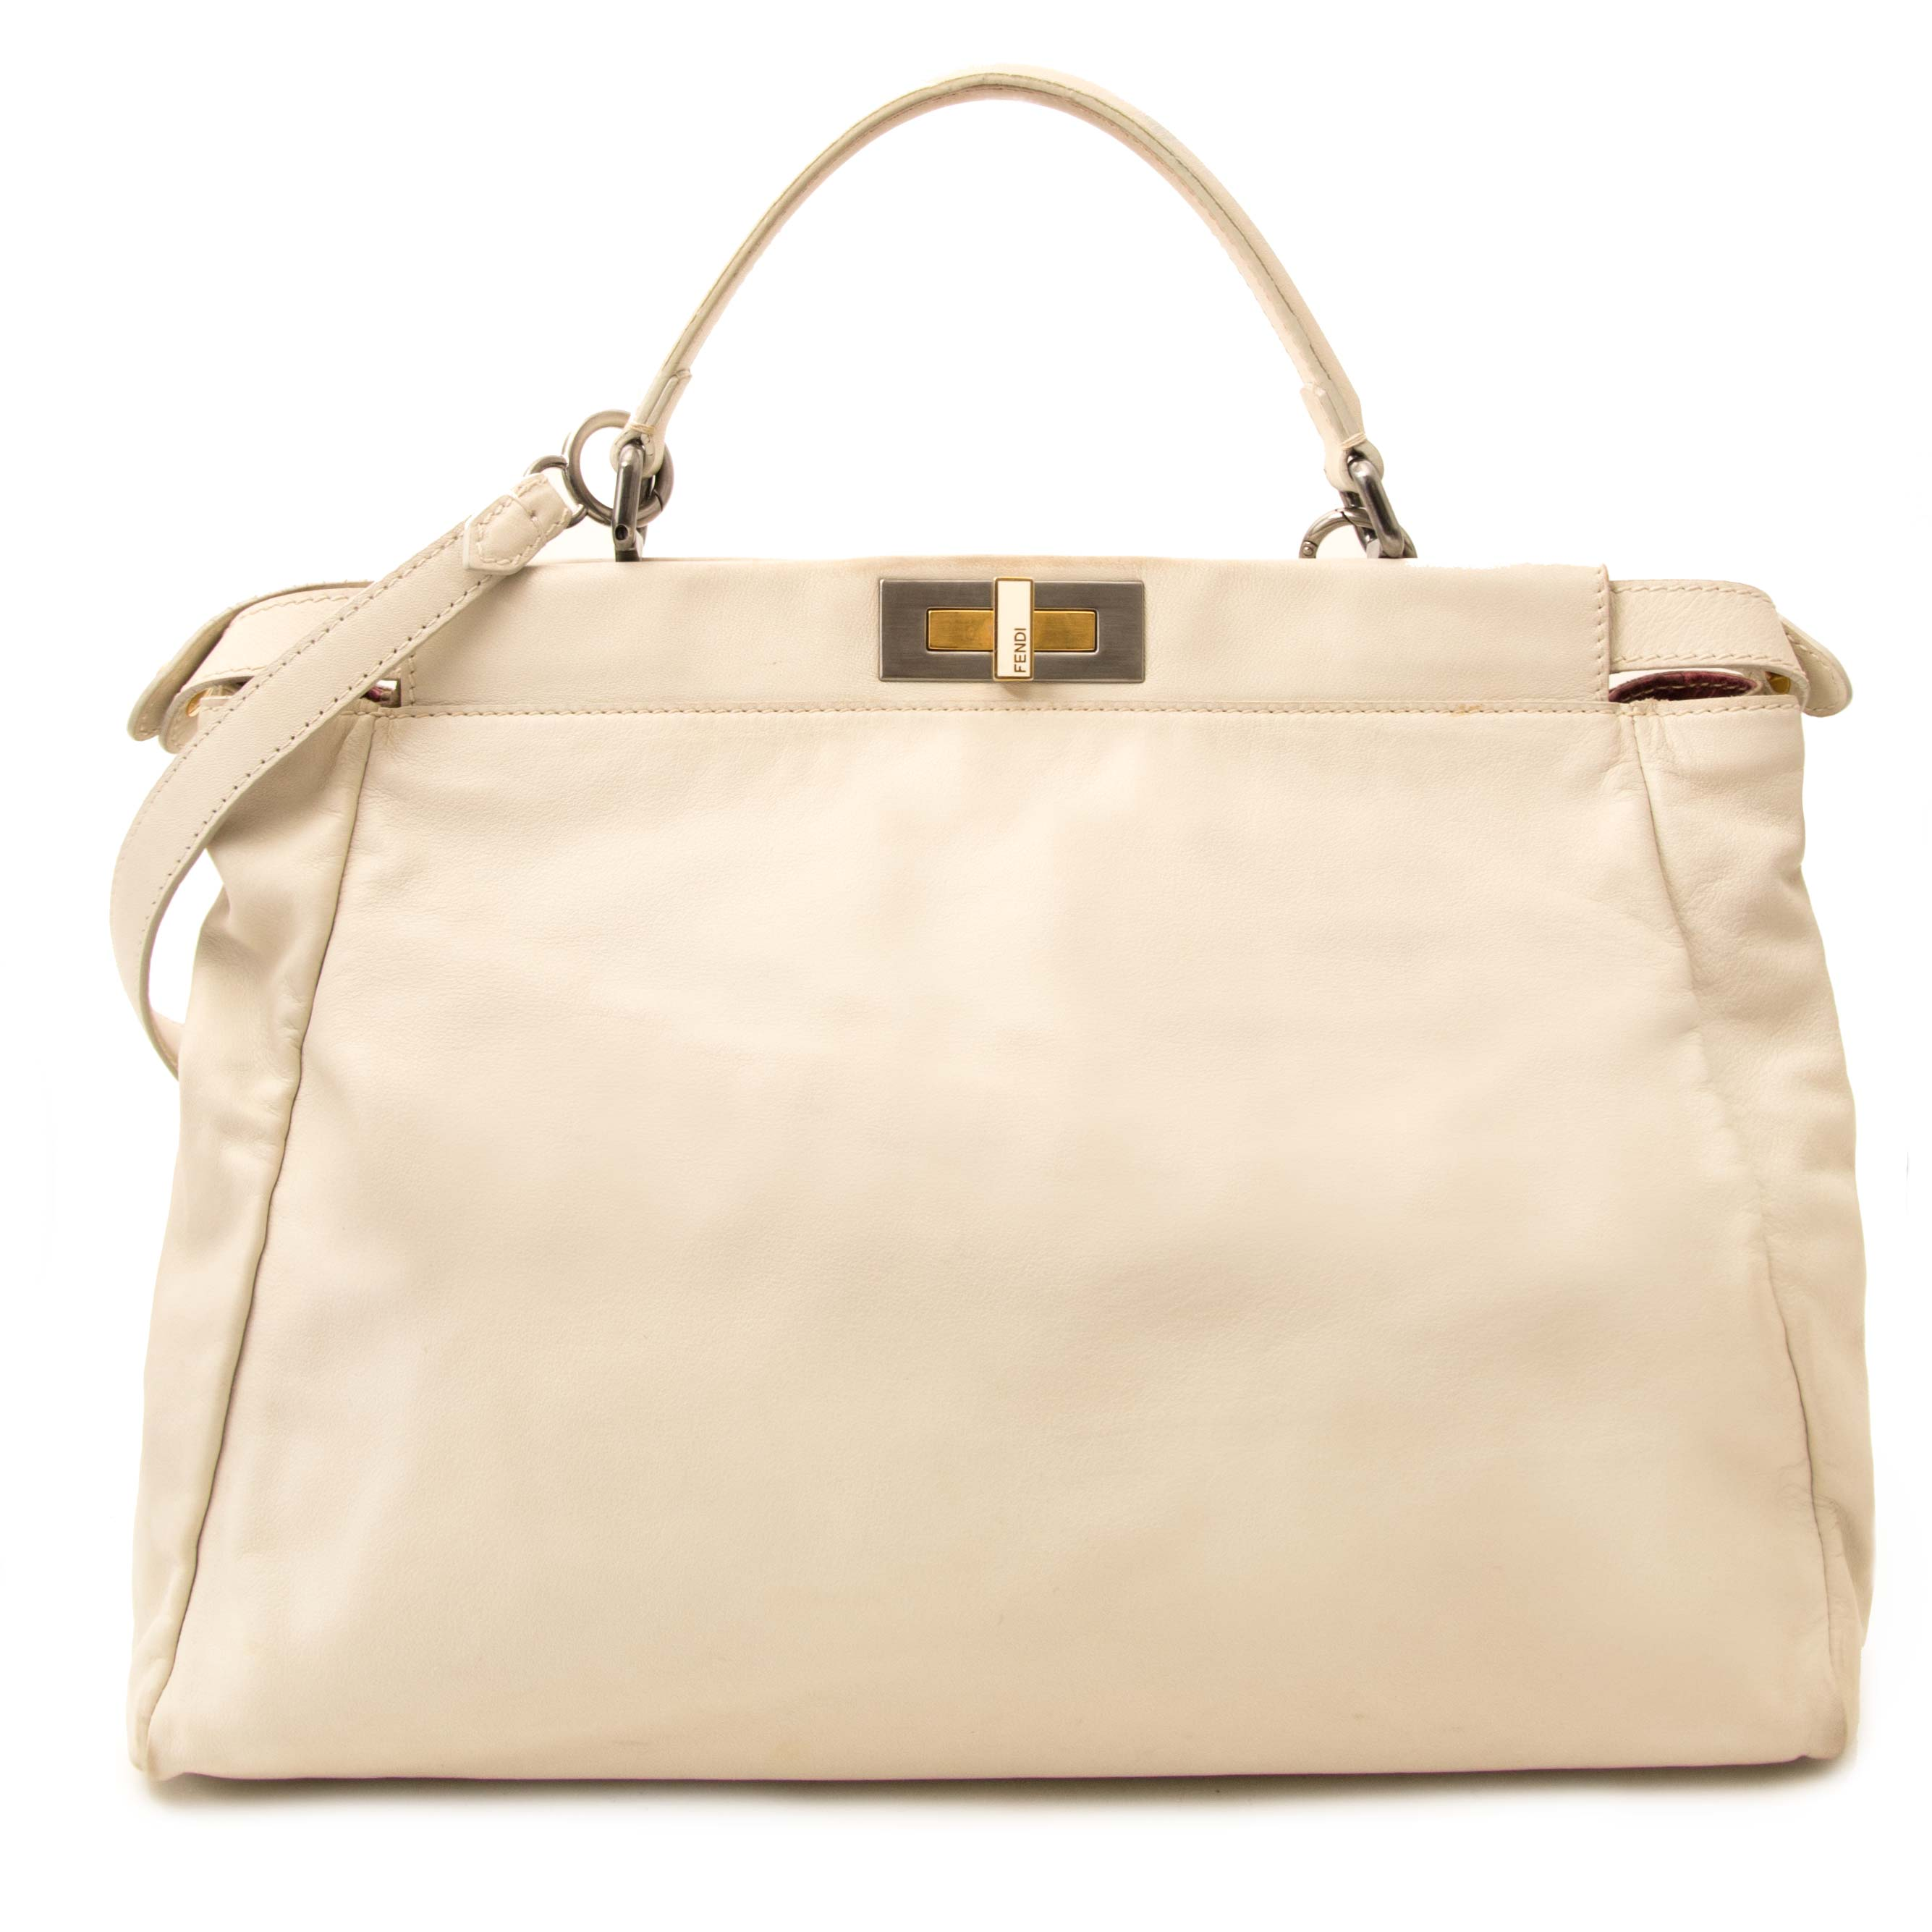 7535f6c05c ... acheter en ligne seconde main Fendi blanche cuire And rose Python Large  Peekaboo Bag